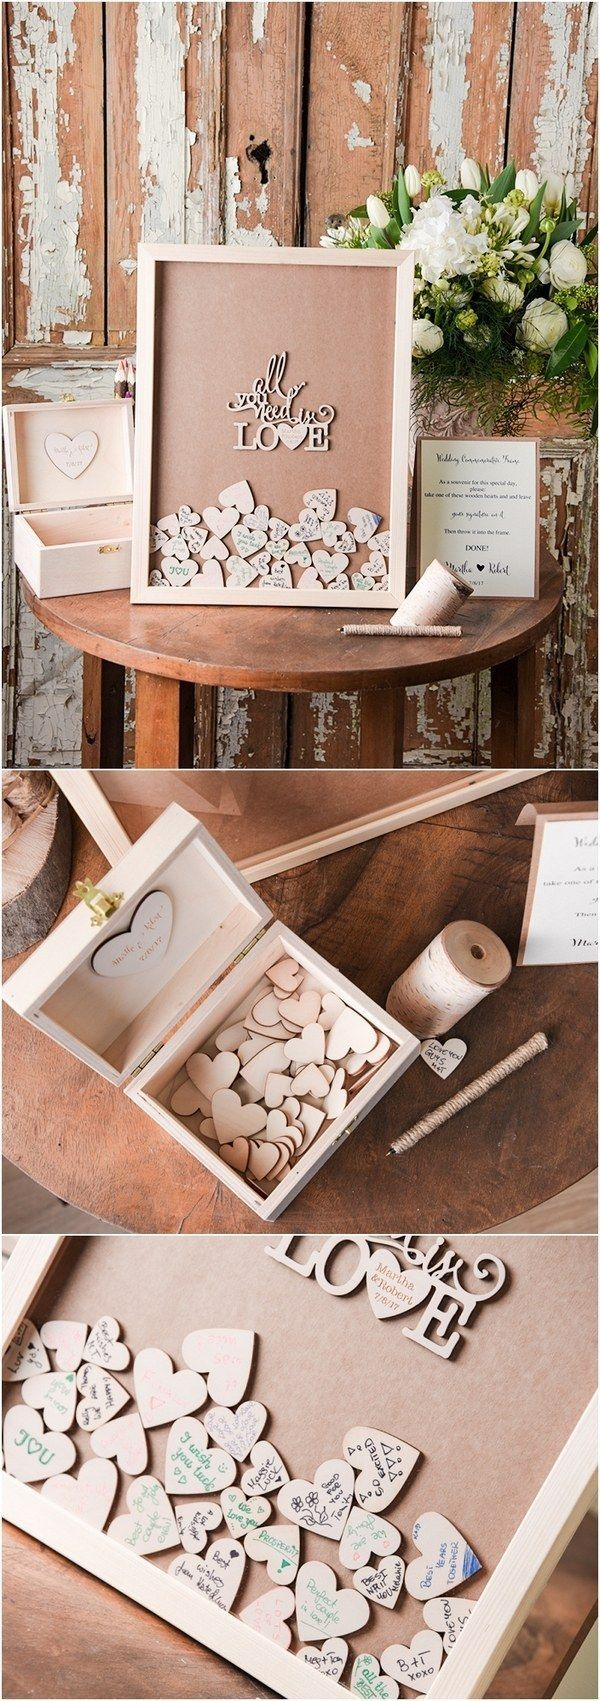 Rustic Laser Cut Wood Wedding Guest Book- All you need is love / http://www.deerpearlflowers.com/rustic-wedding-guest-books-botanical-wedding-invitations/